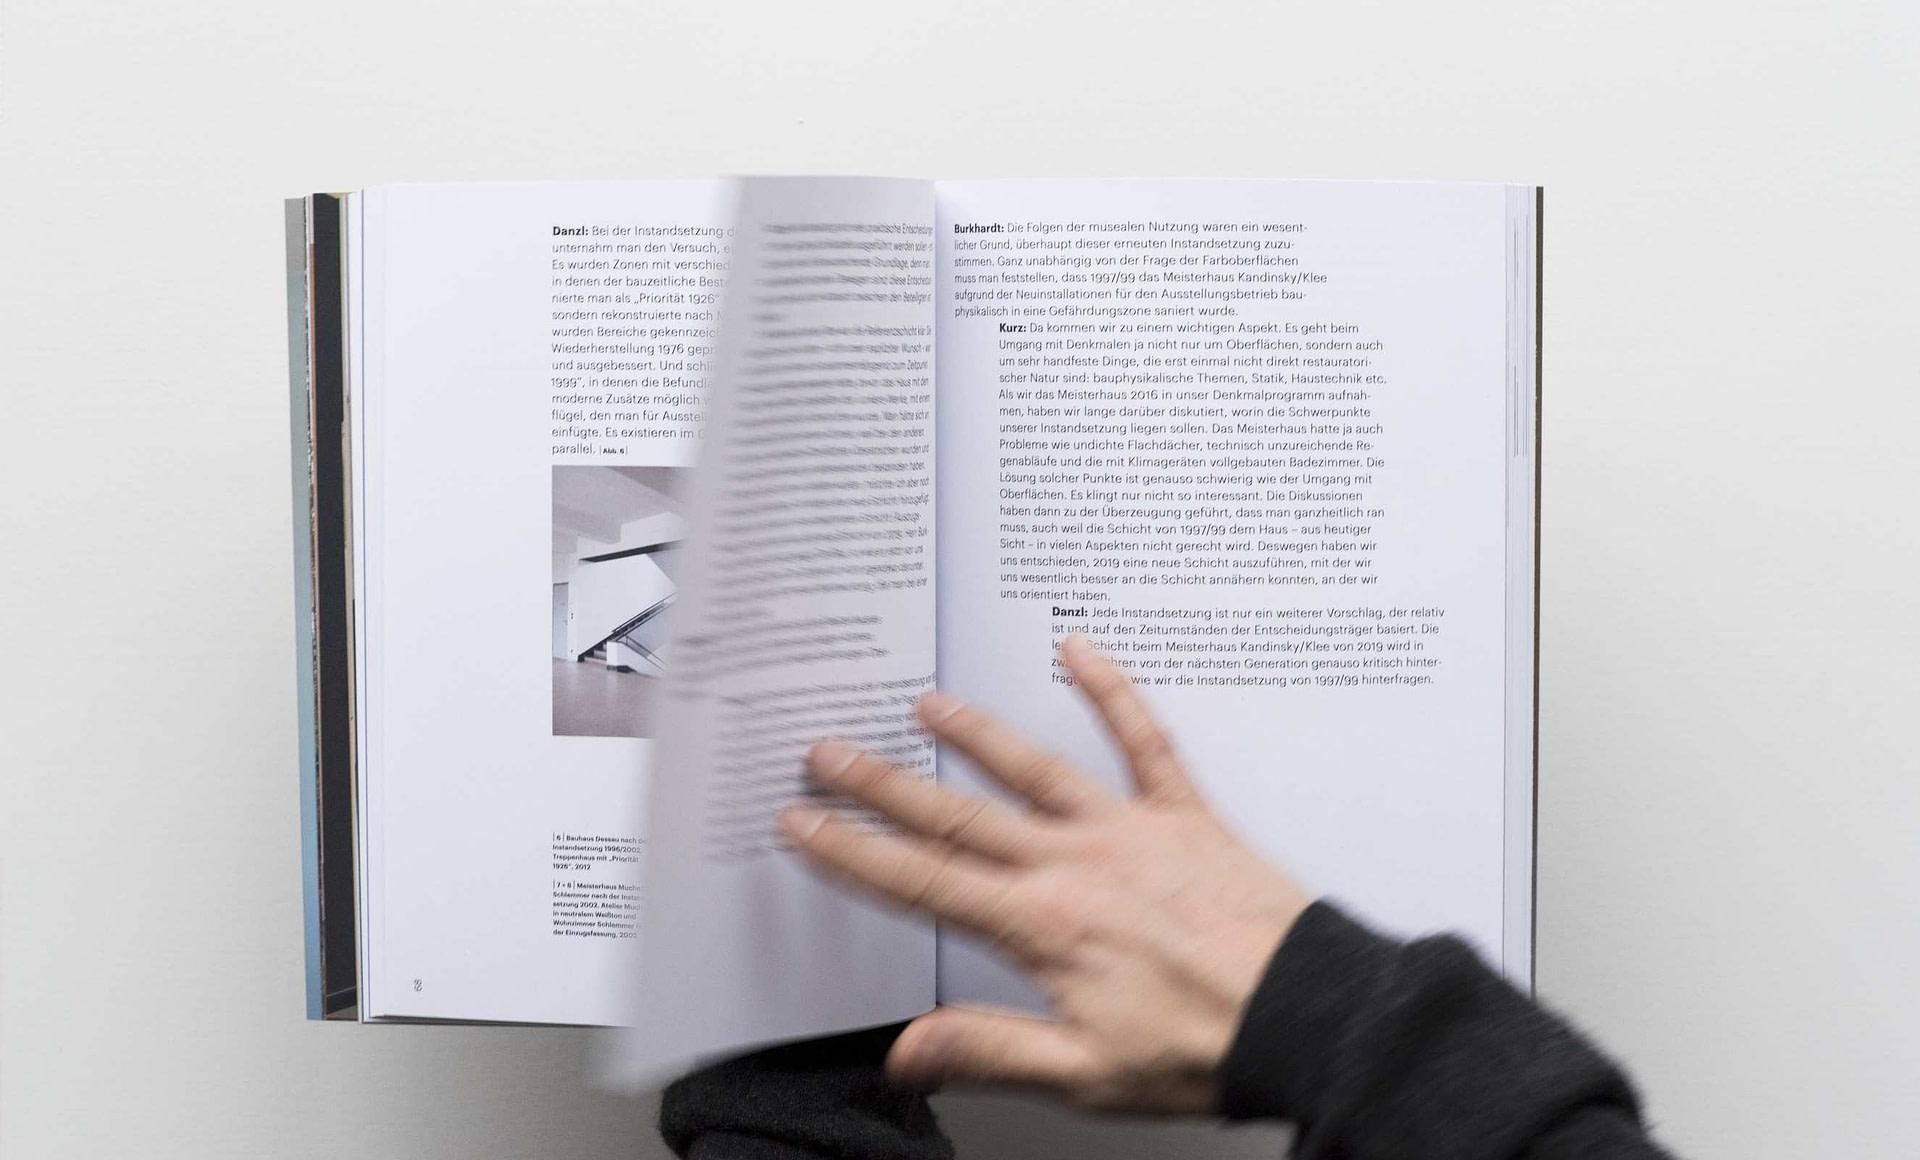 meisterhaus-kandinsky-klee-book-9-2650x1600px